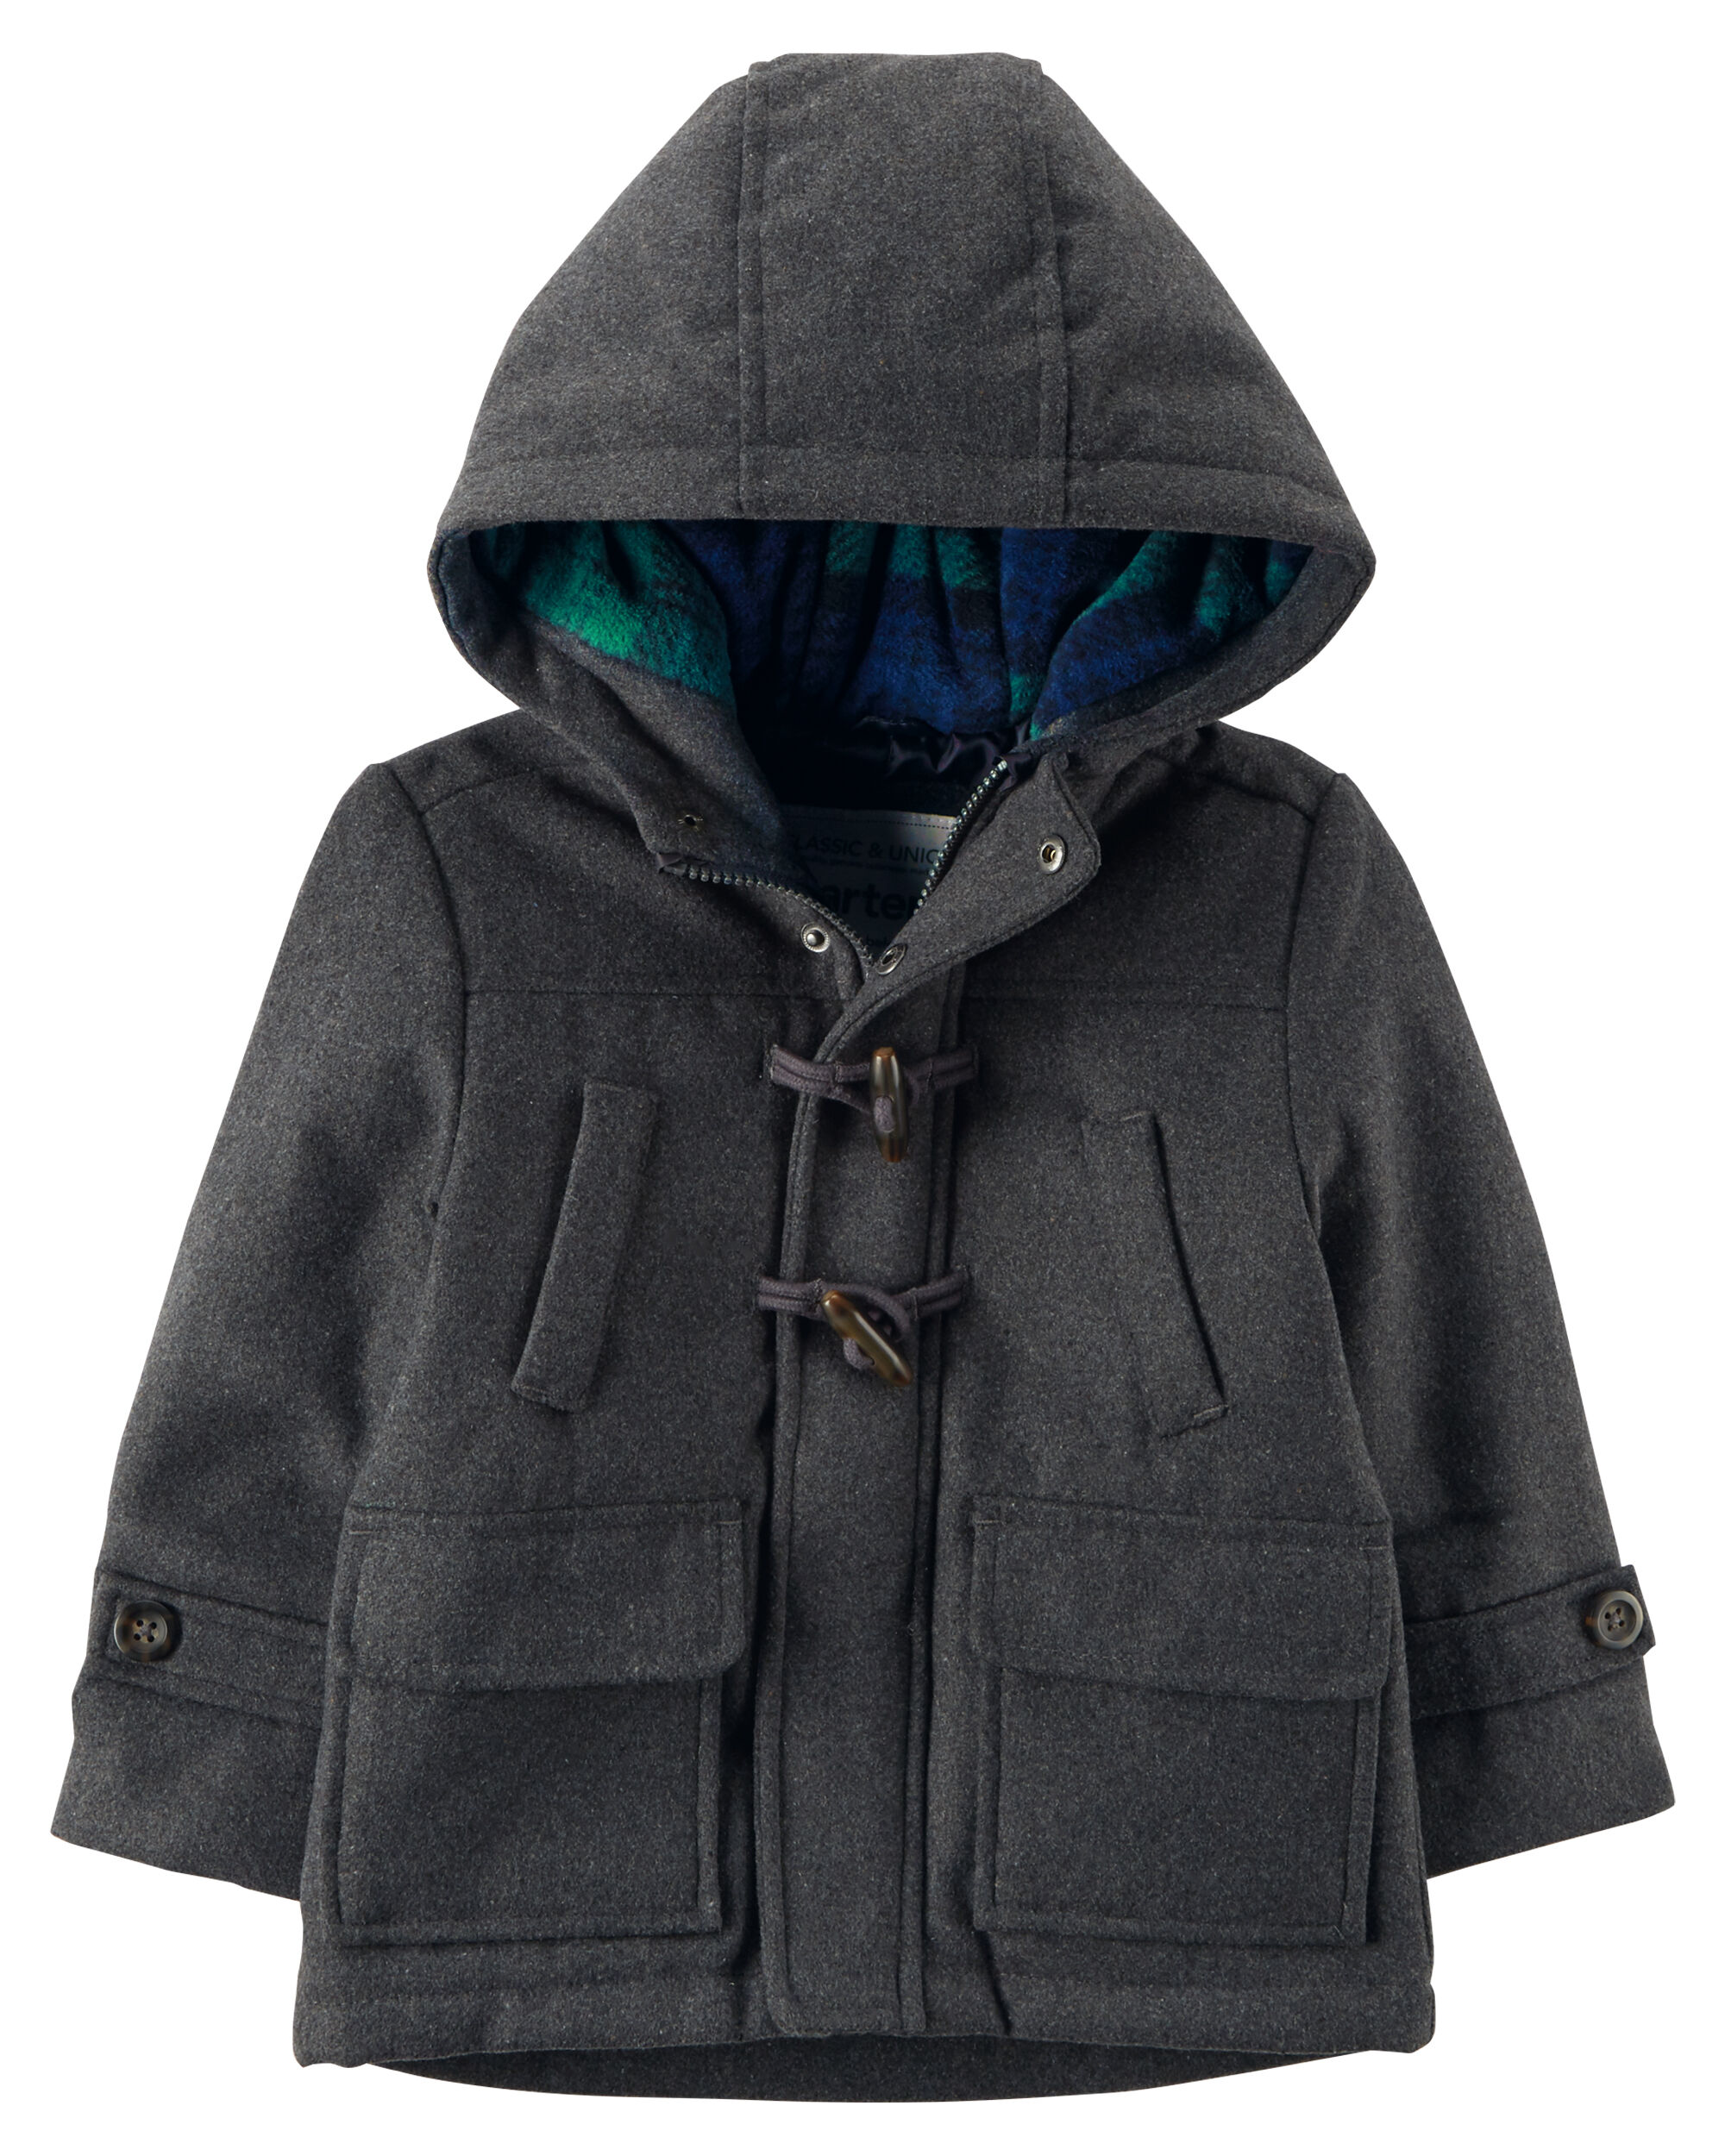 Fleece-Lined Jacket | Carters.com